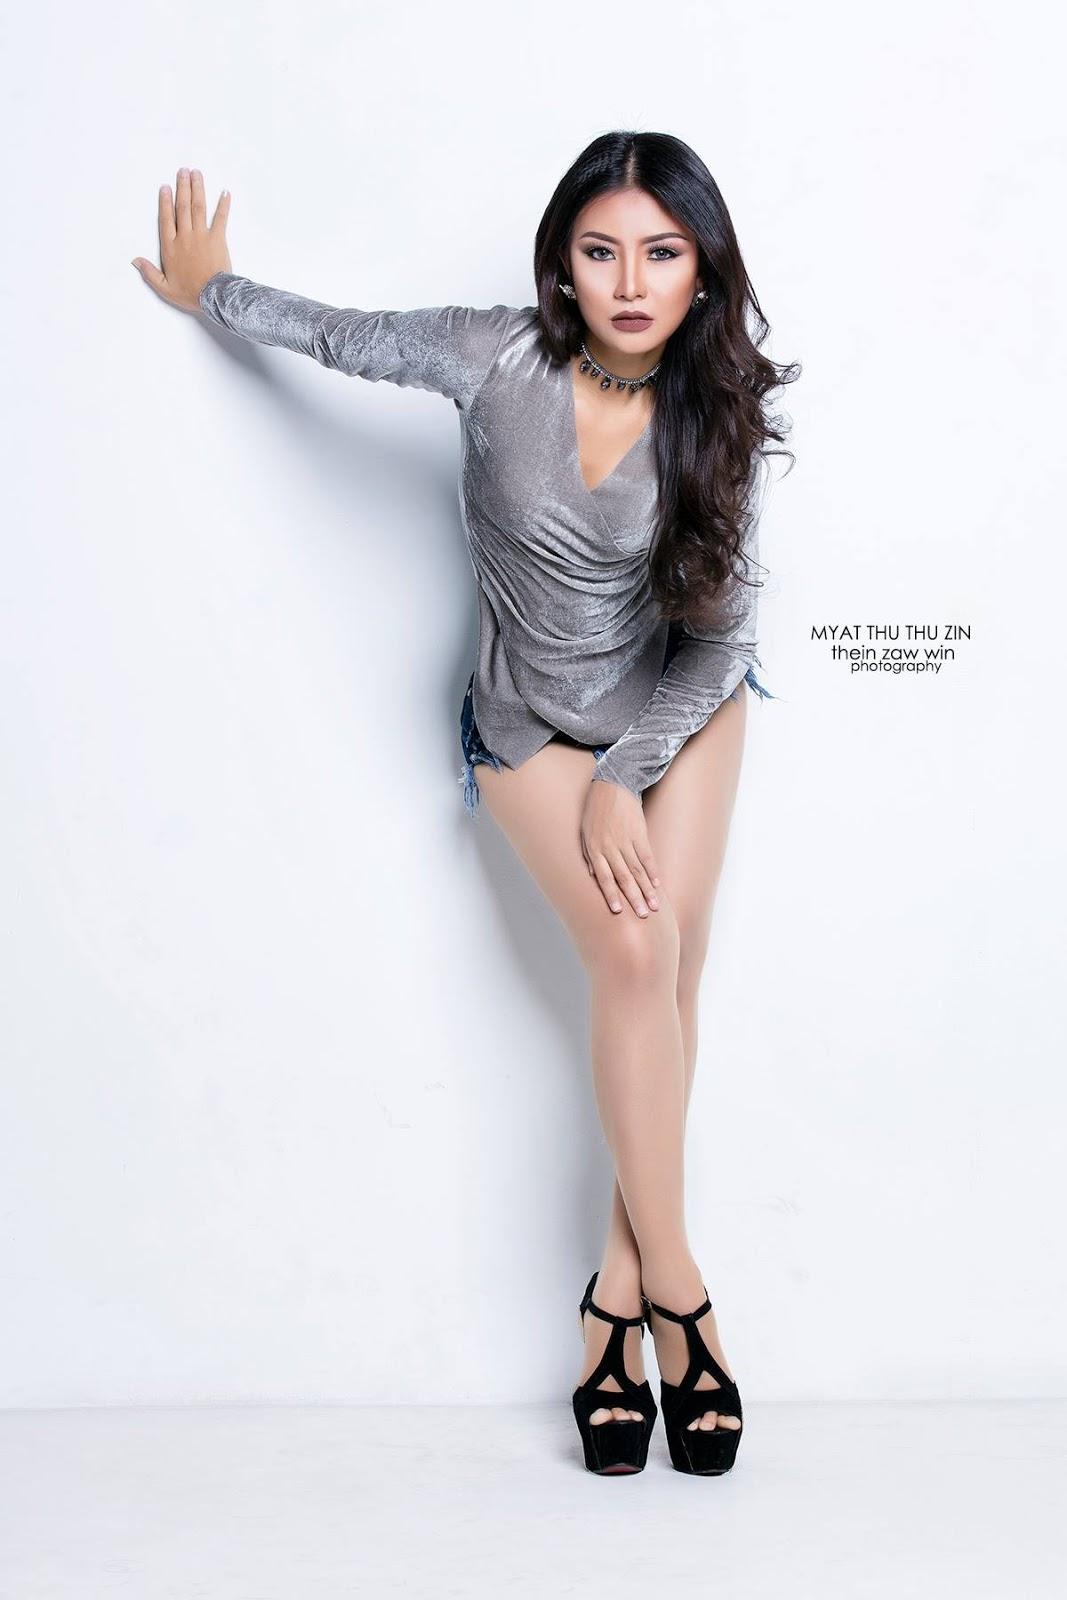 Myat Thu Thu Zin - Sunday Journal Cover Photoshoot